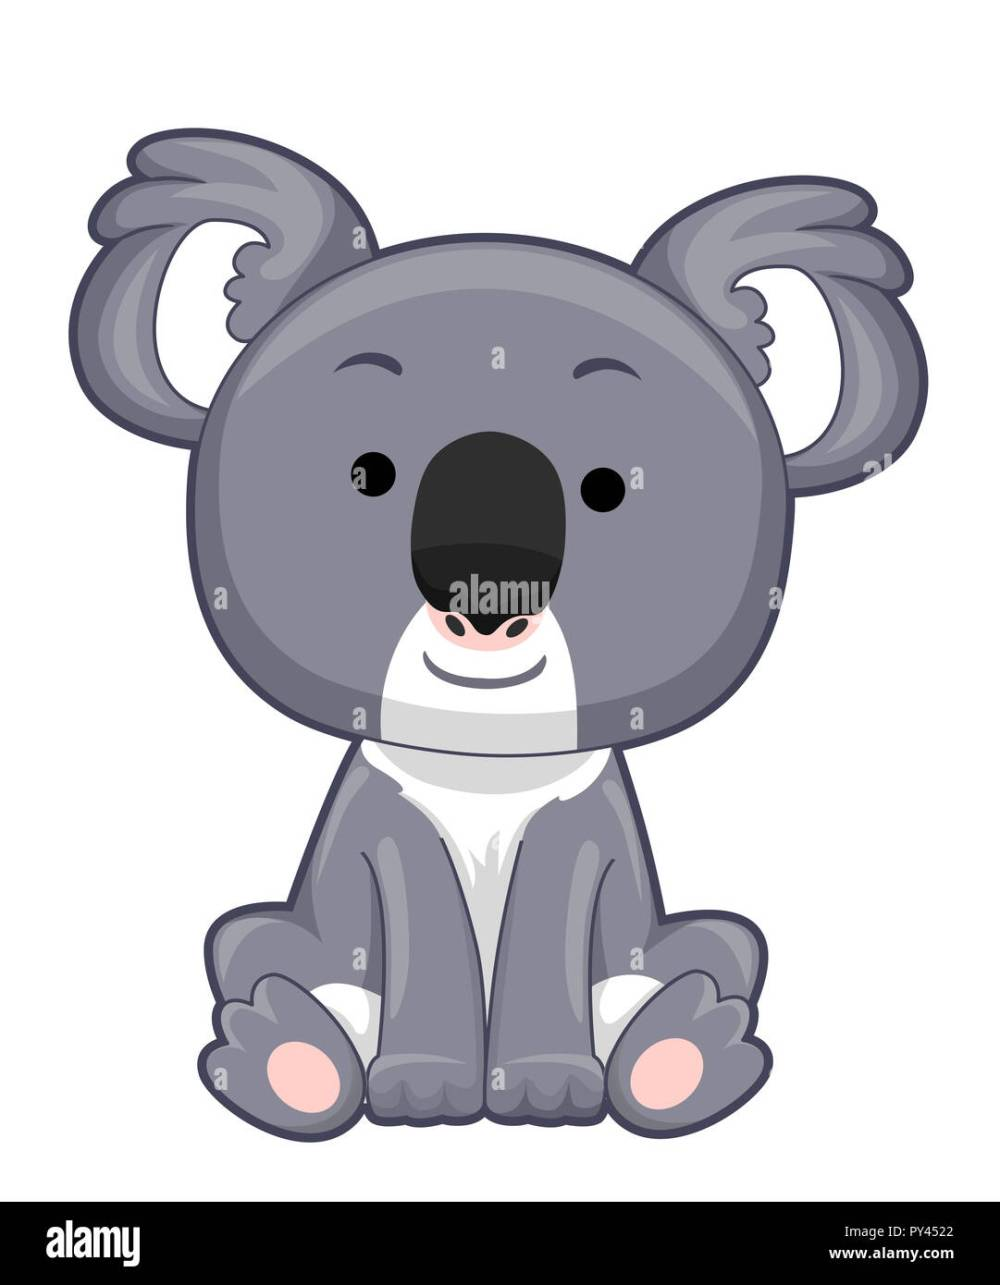 medium resolution of illustration of a koala bear sitting down stock image